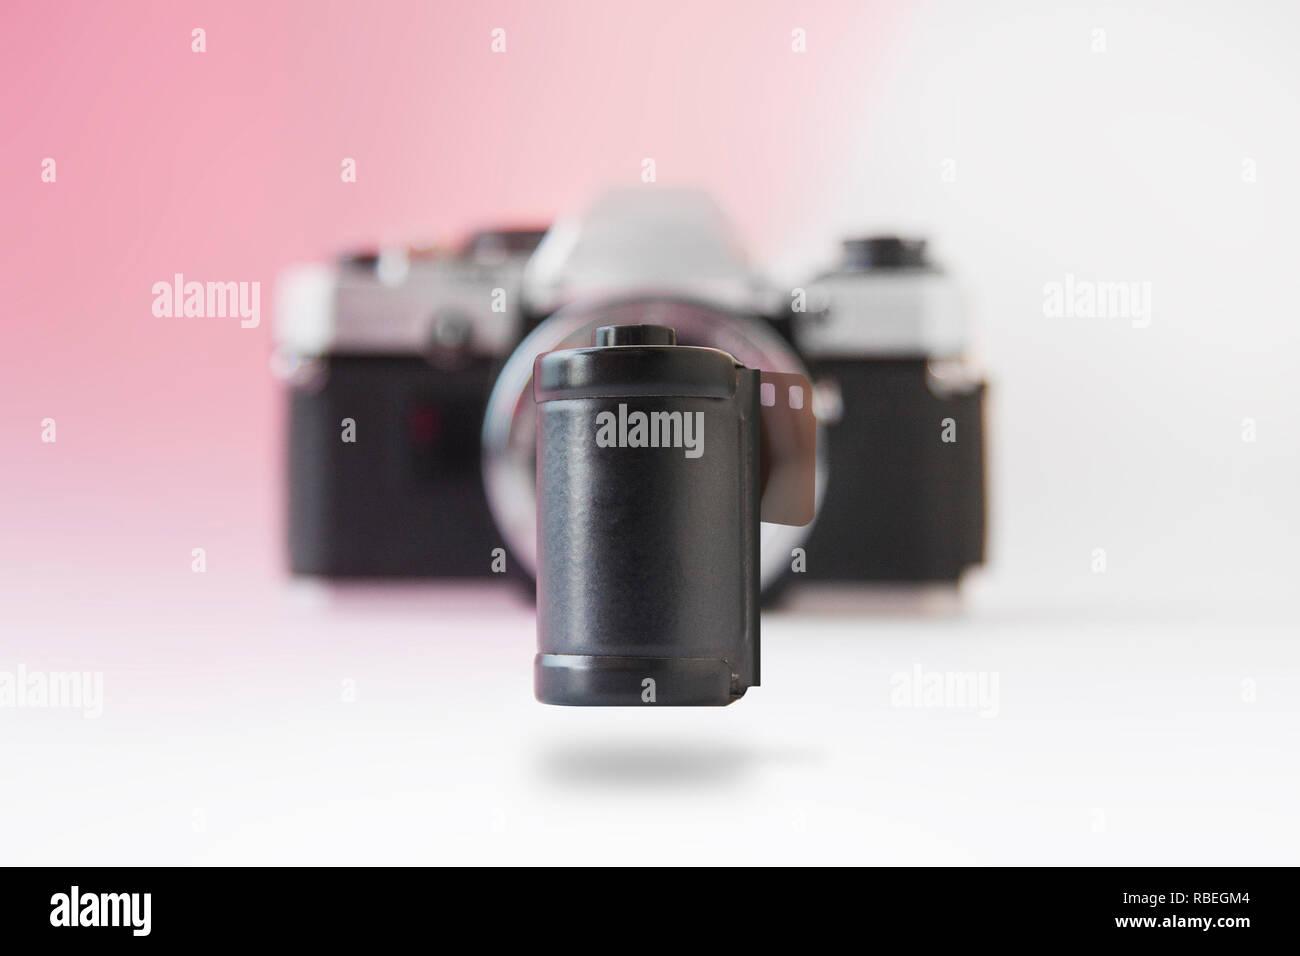 Soaring 35 mm Negative Film Canister on Blurry SLR Camera Back - Stock Image